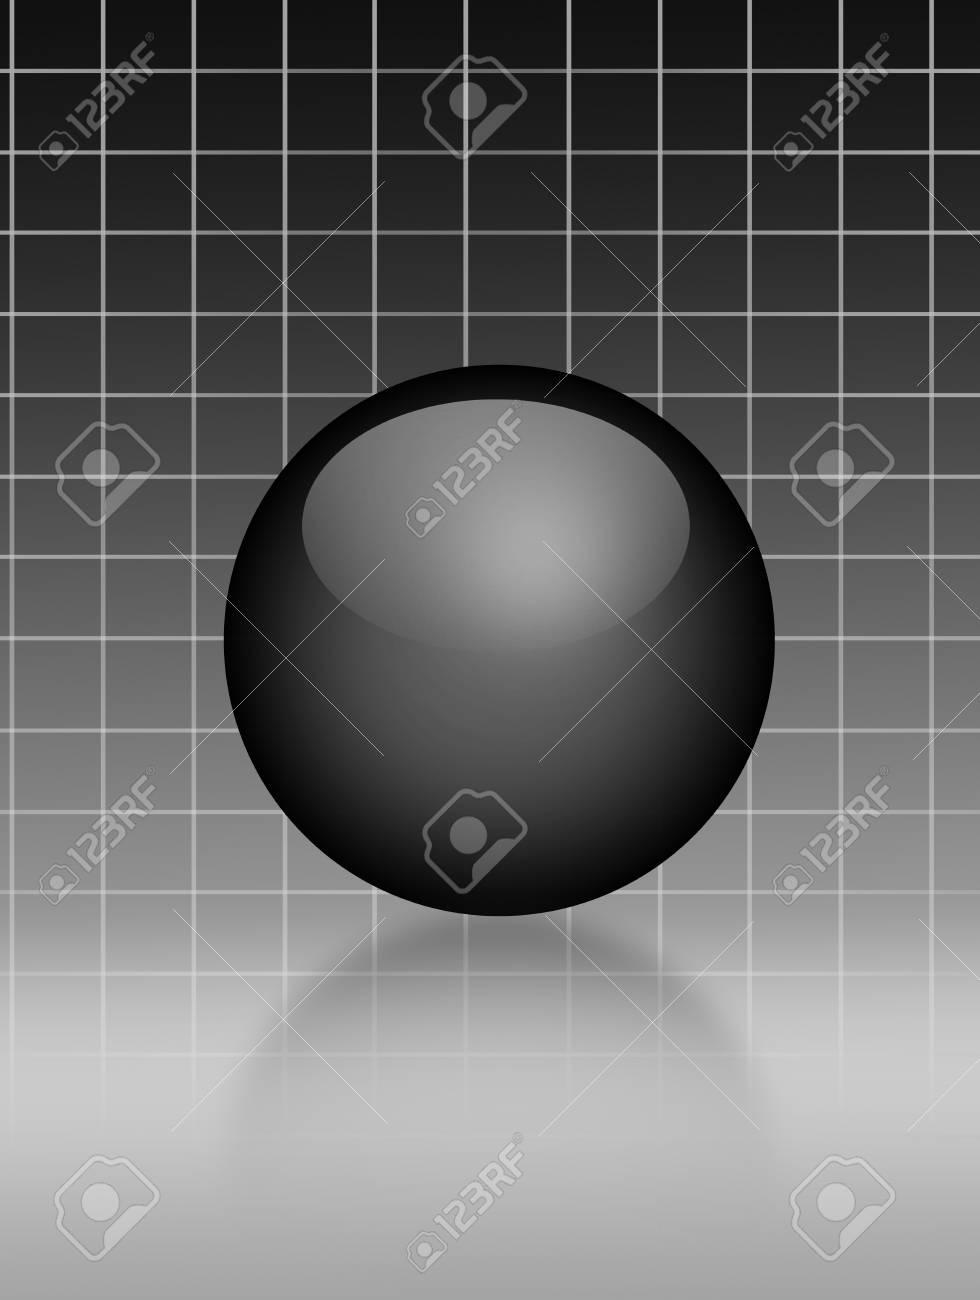 Black sphere over gray lines background. Illustration Stock Illustration - 9692940